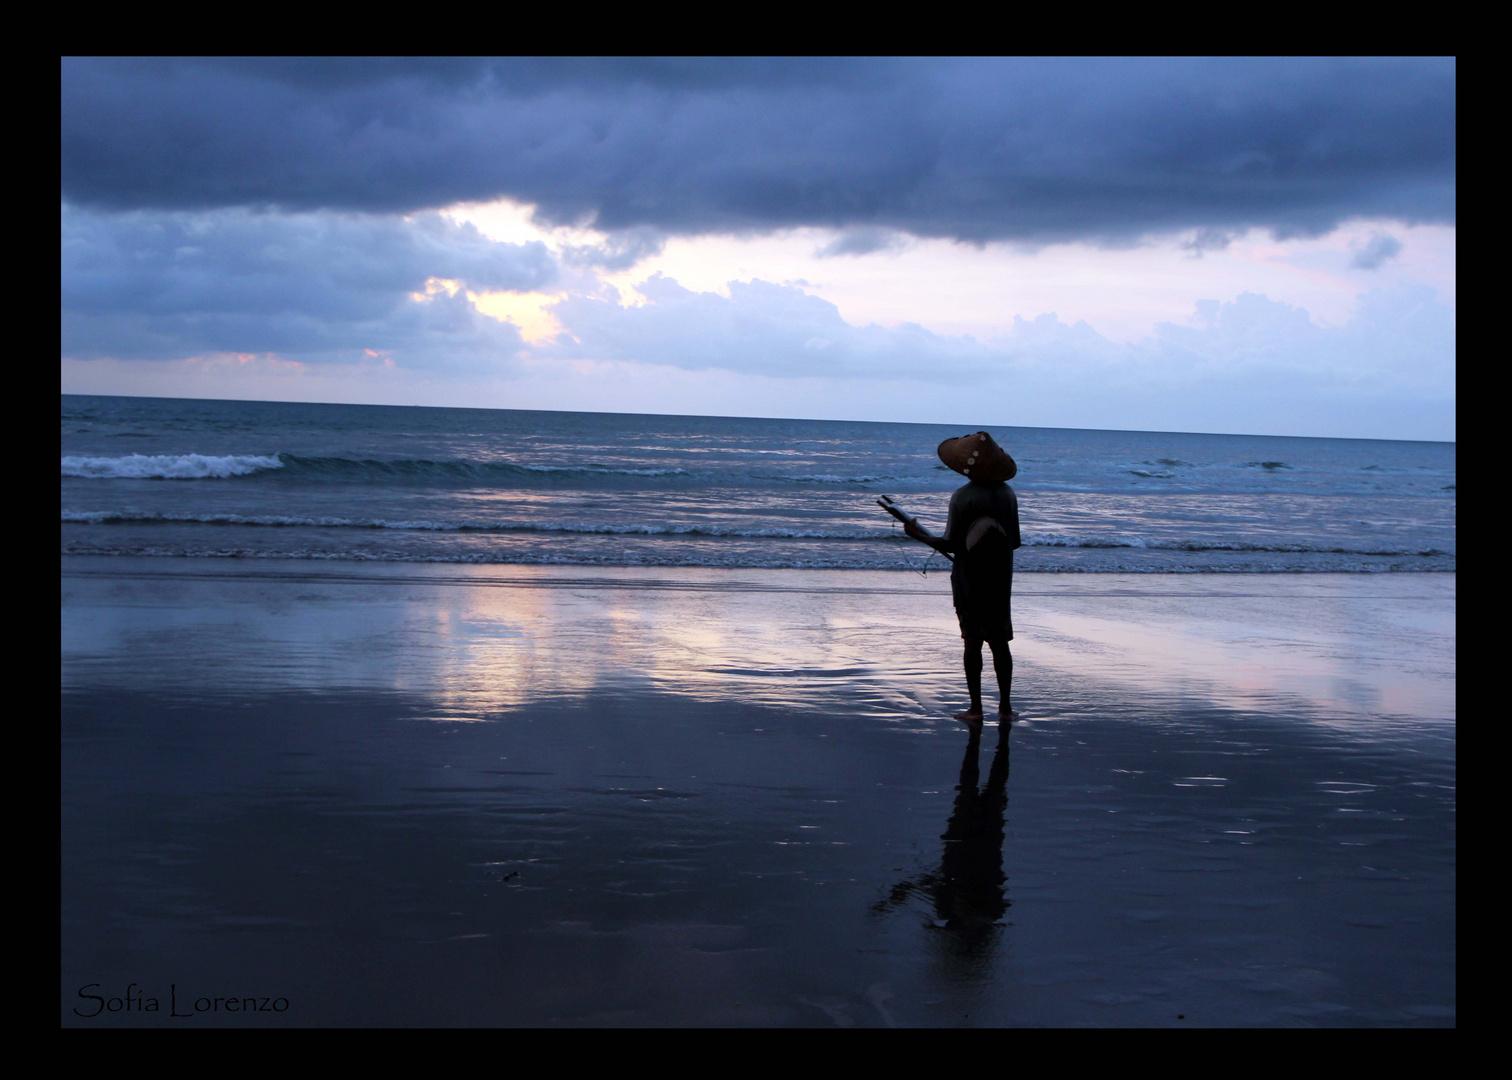 Fisher. Bali